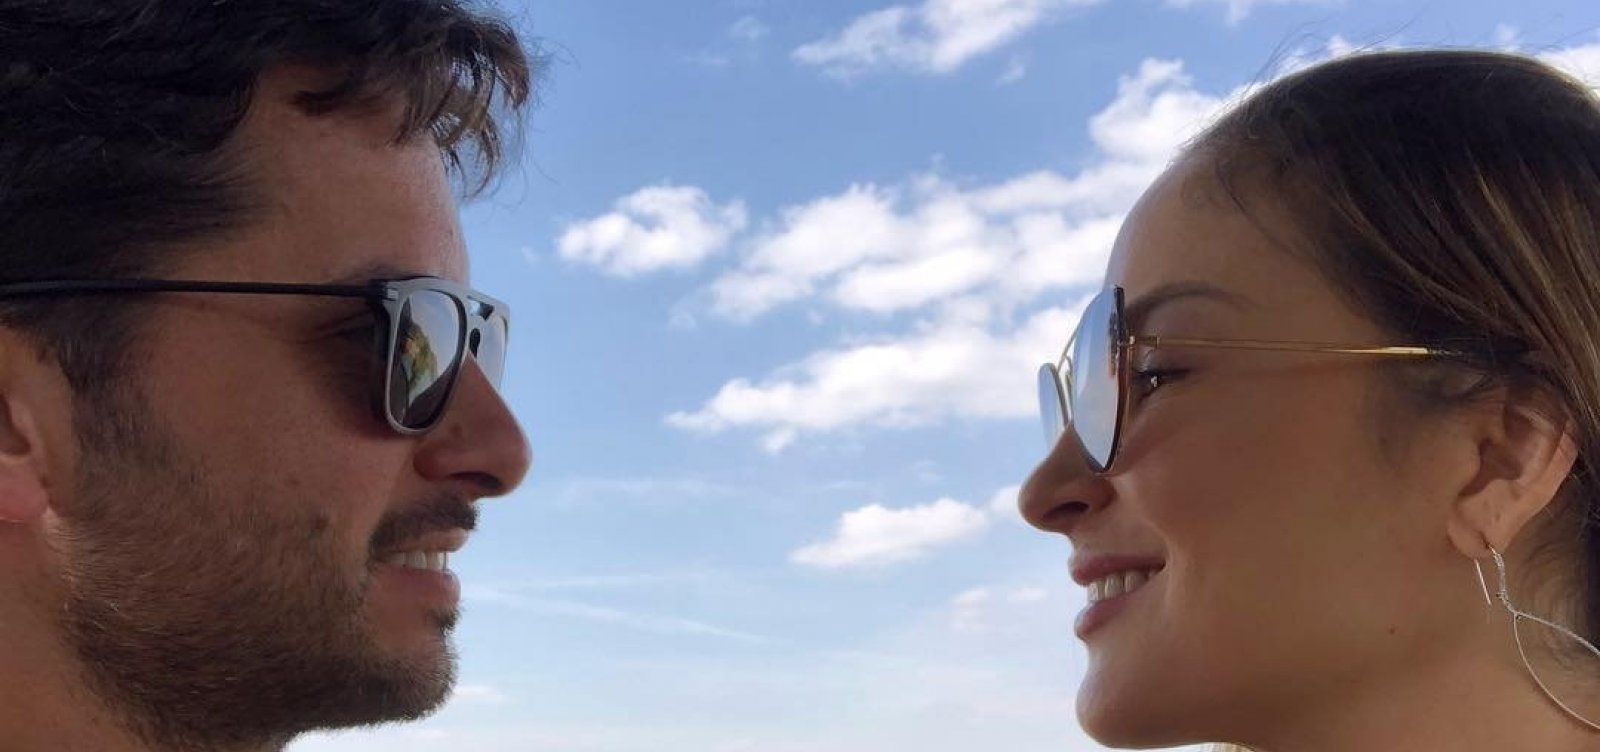 [Marido de Claudia Leitte se manifesta após assédio de Silvio Santos]